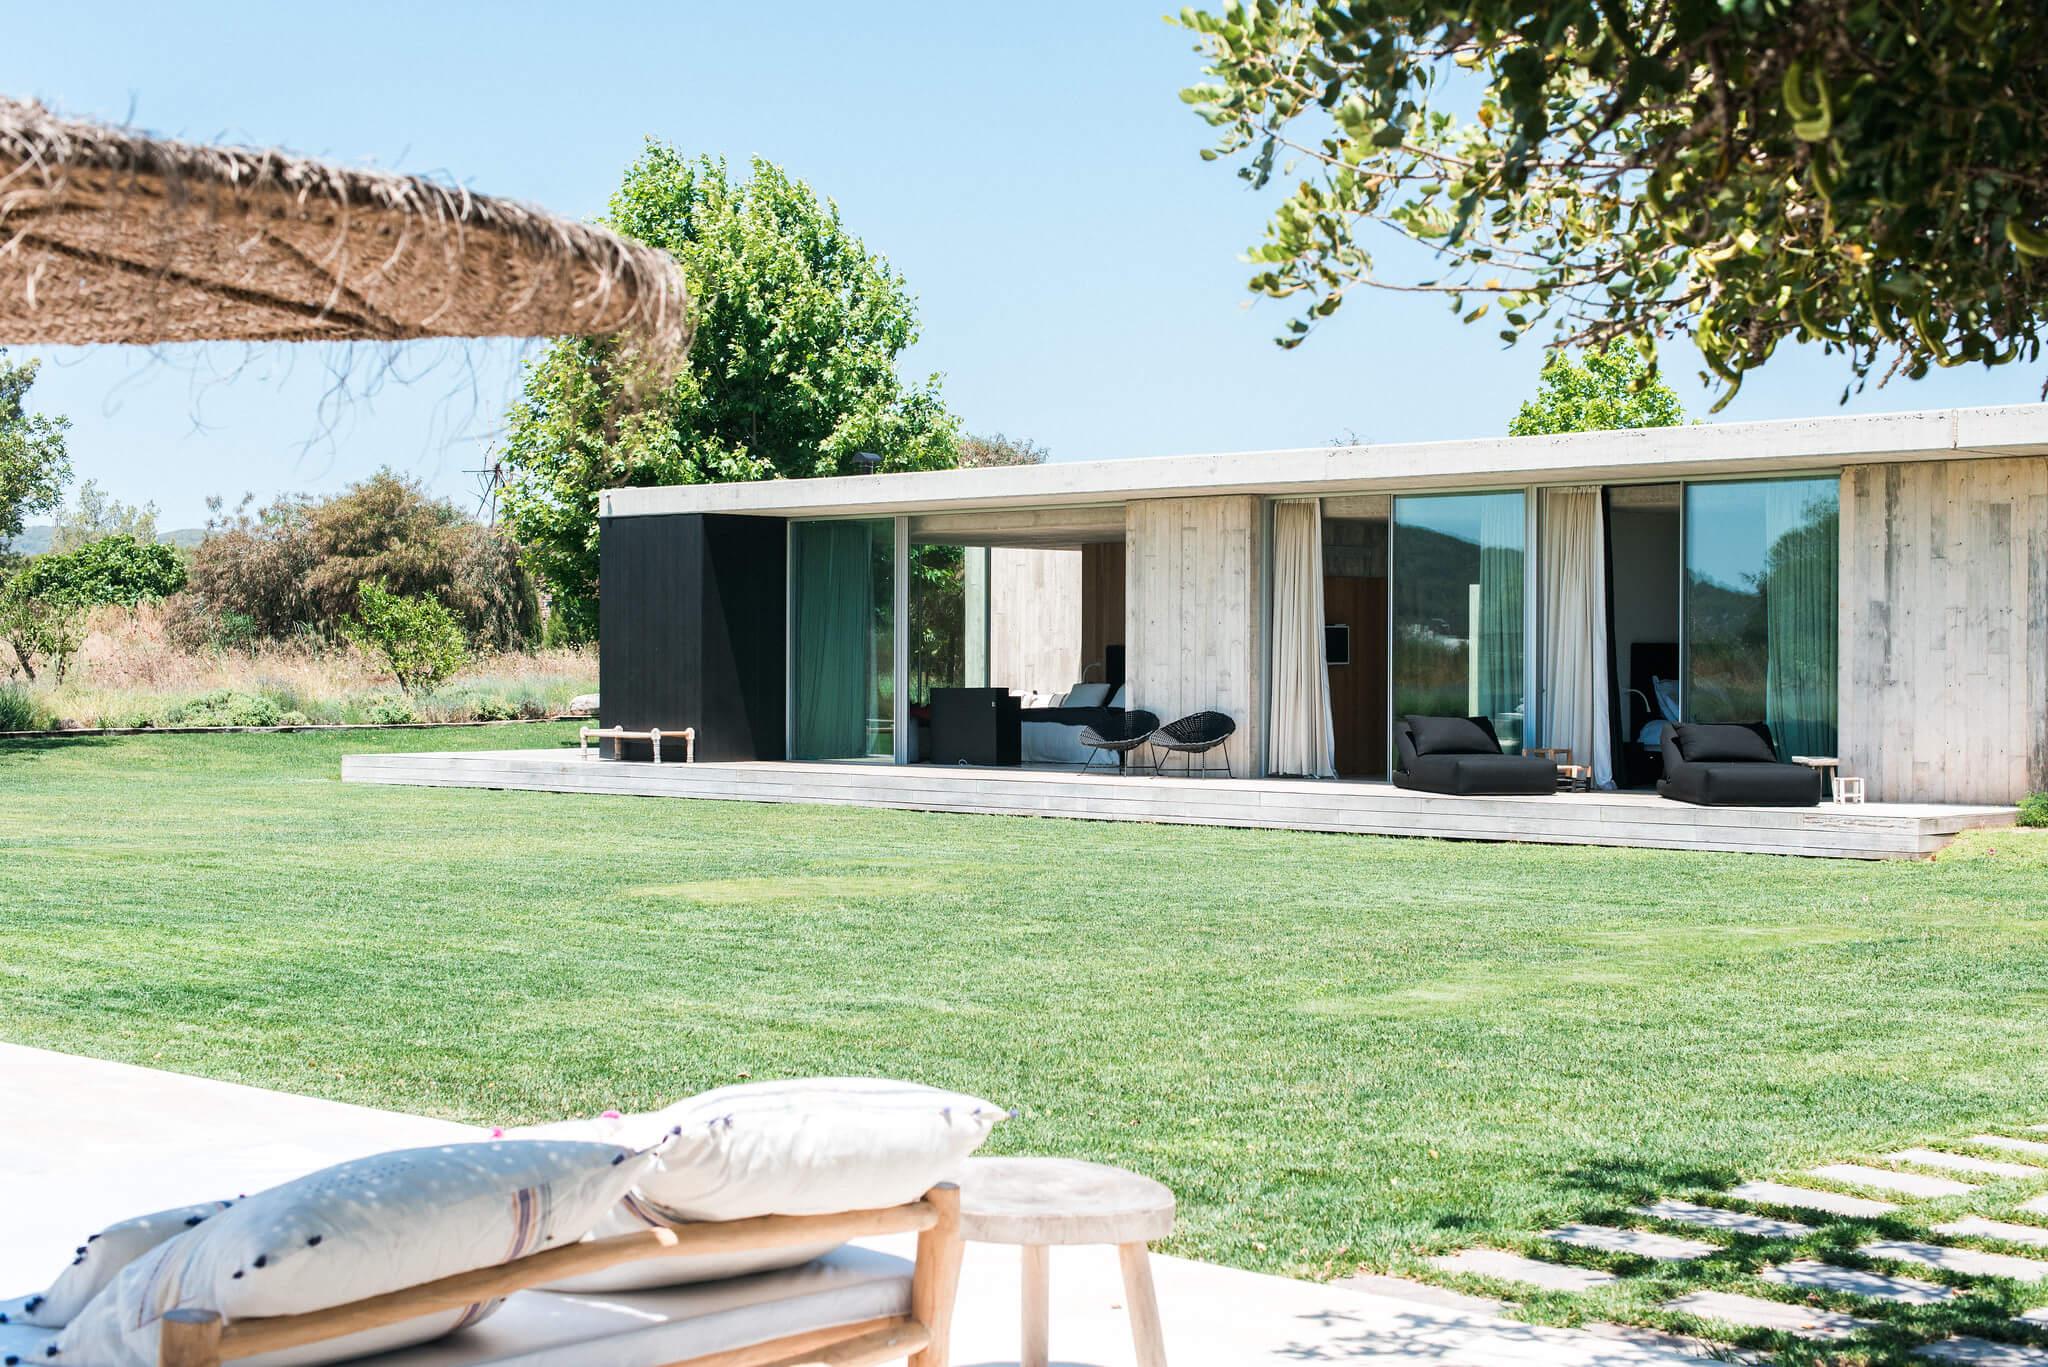 https://www.white-ibiza.com/wp-content/uploads/2020/06/white-ibiza-villas-casa-valentina-exterior-view2.jpg